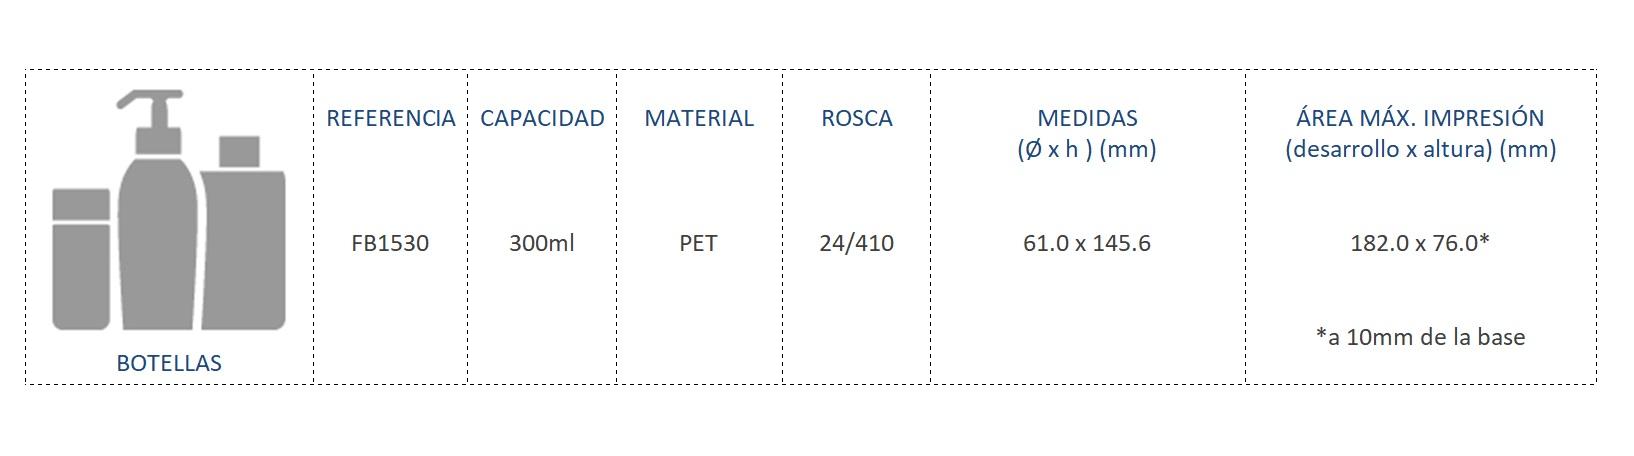 Cuadro de materiales FB1530